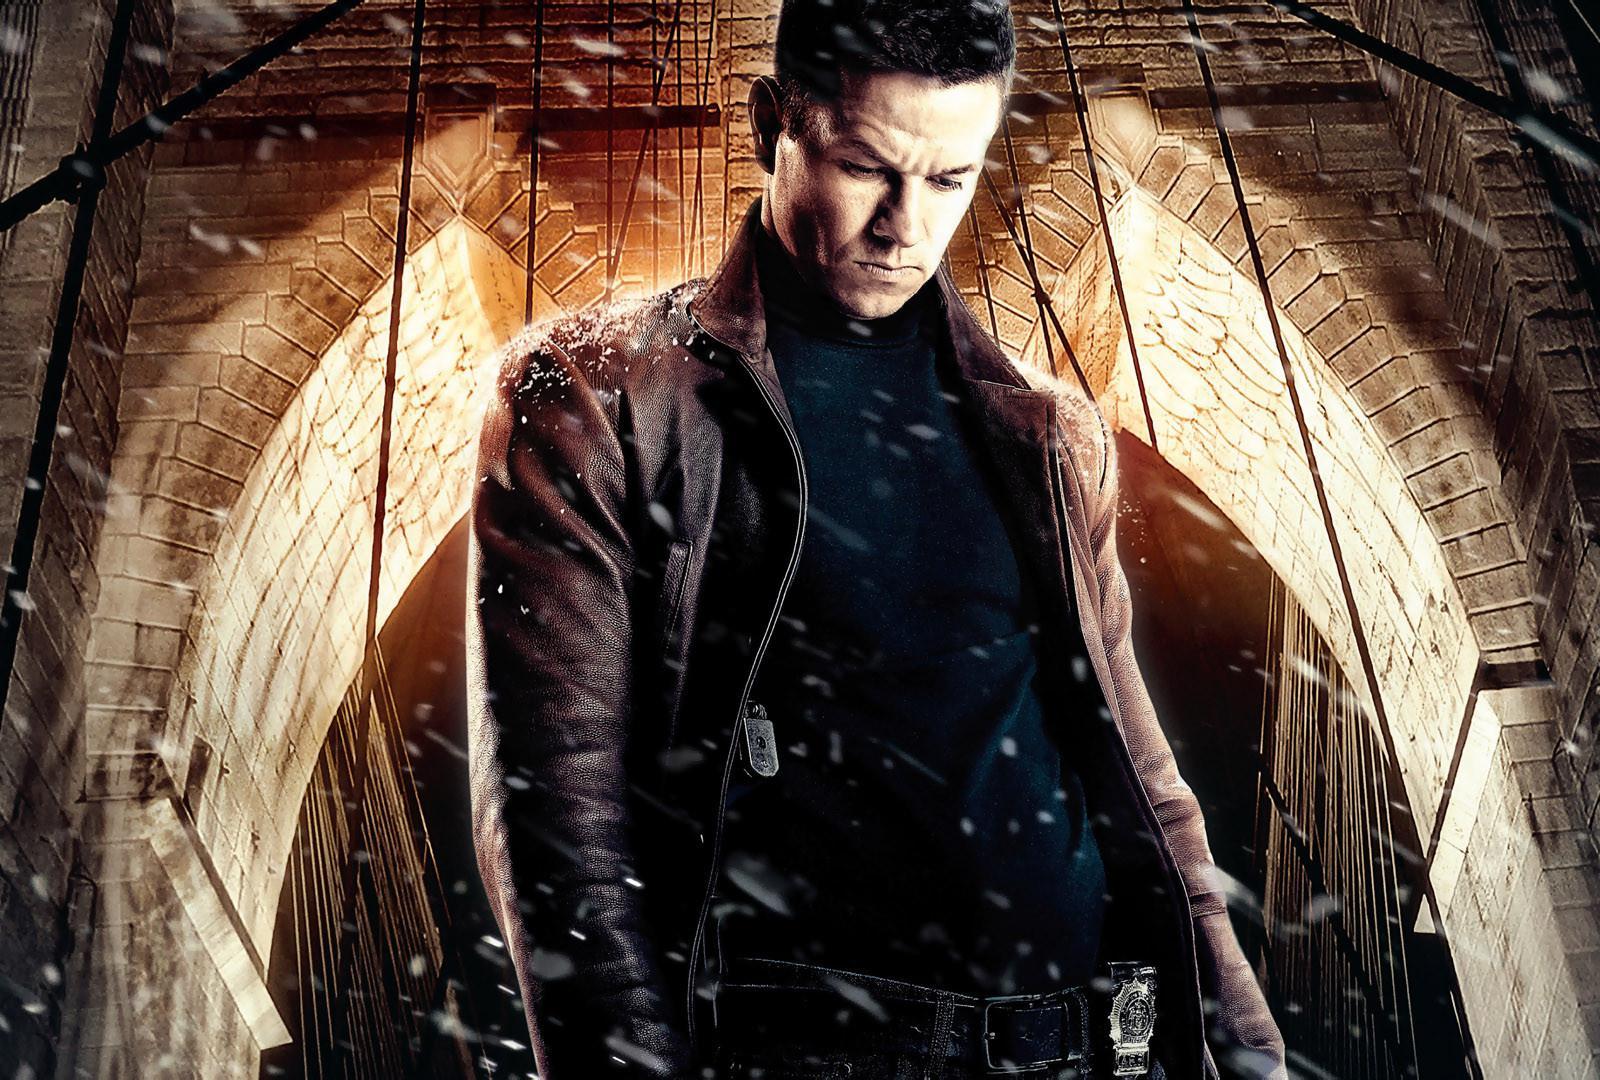 Desktop Wallpaper Max Payne Actor Mark Wahlberg 2008 Movie Hd